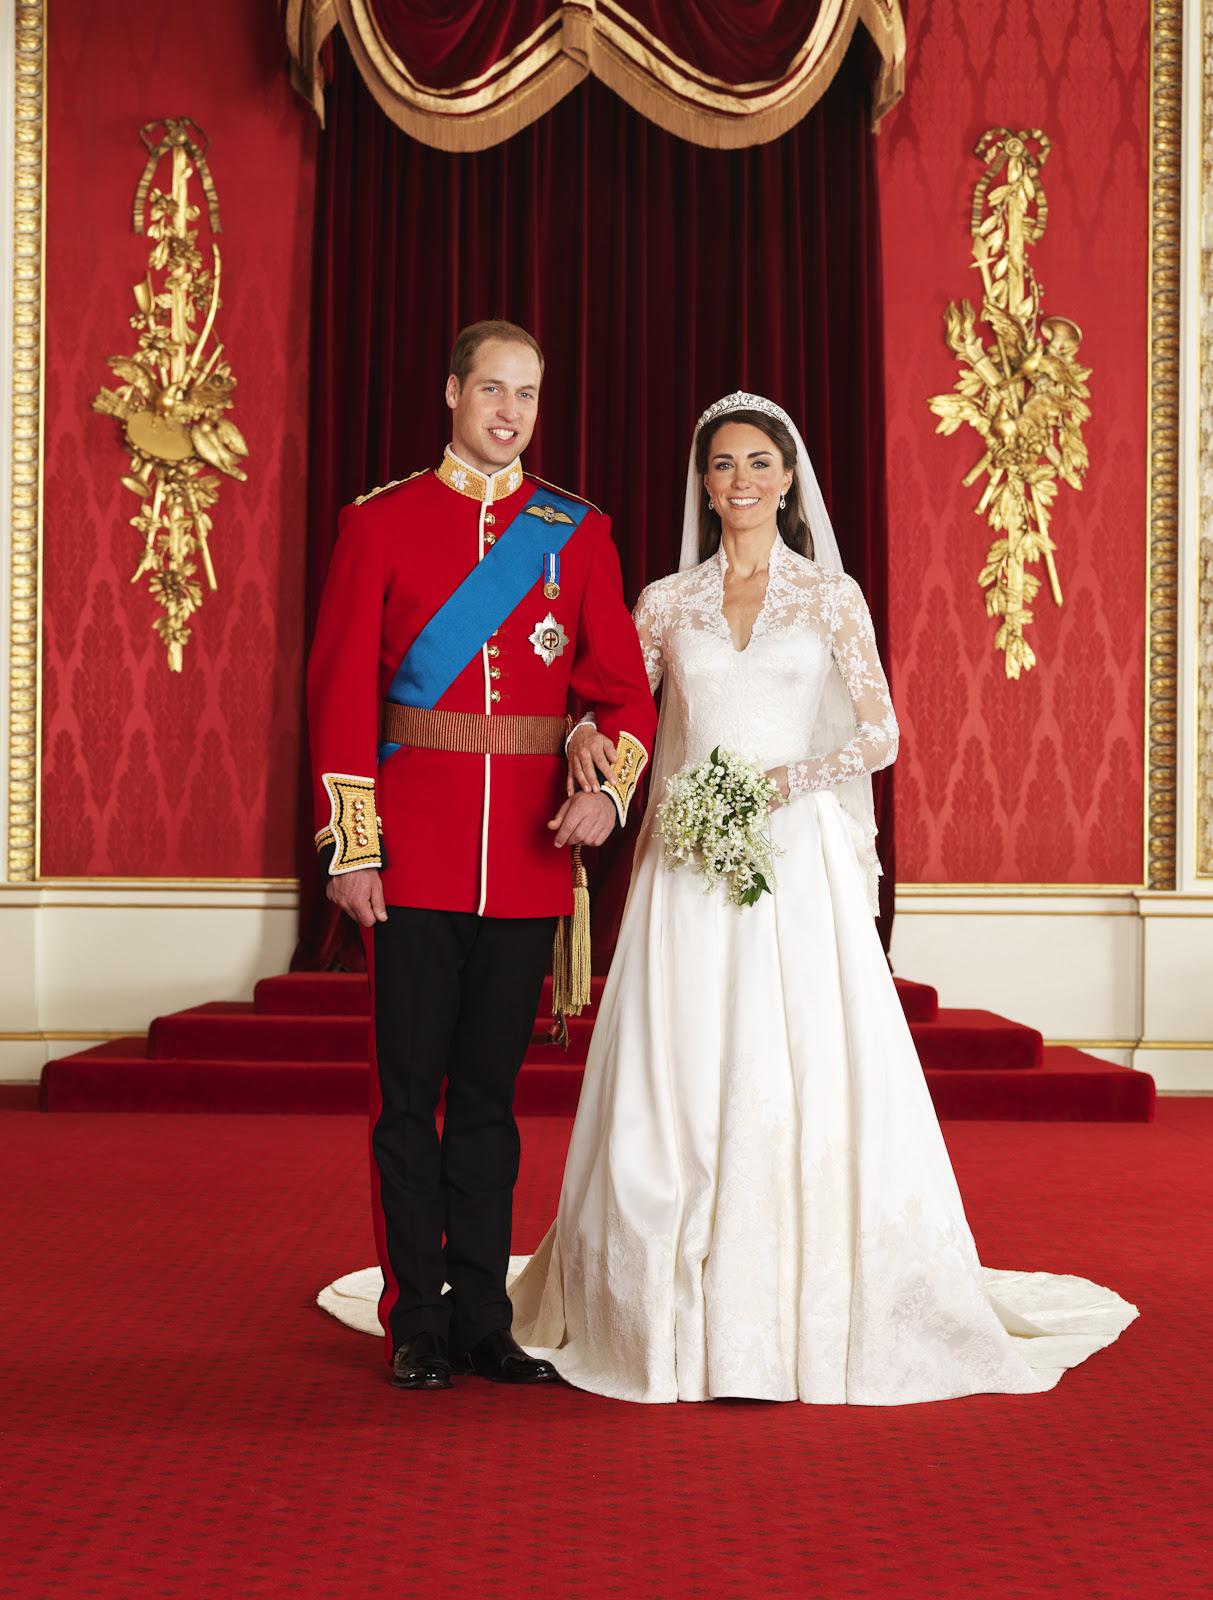 Hugo Burnand: TRH The Duke and Duchess of Cambridge